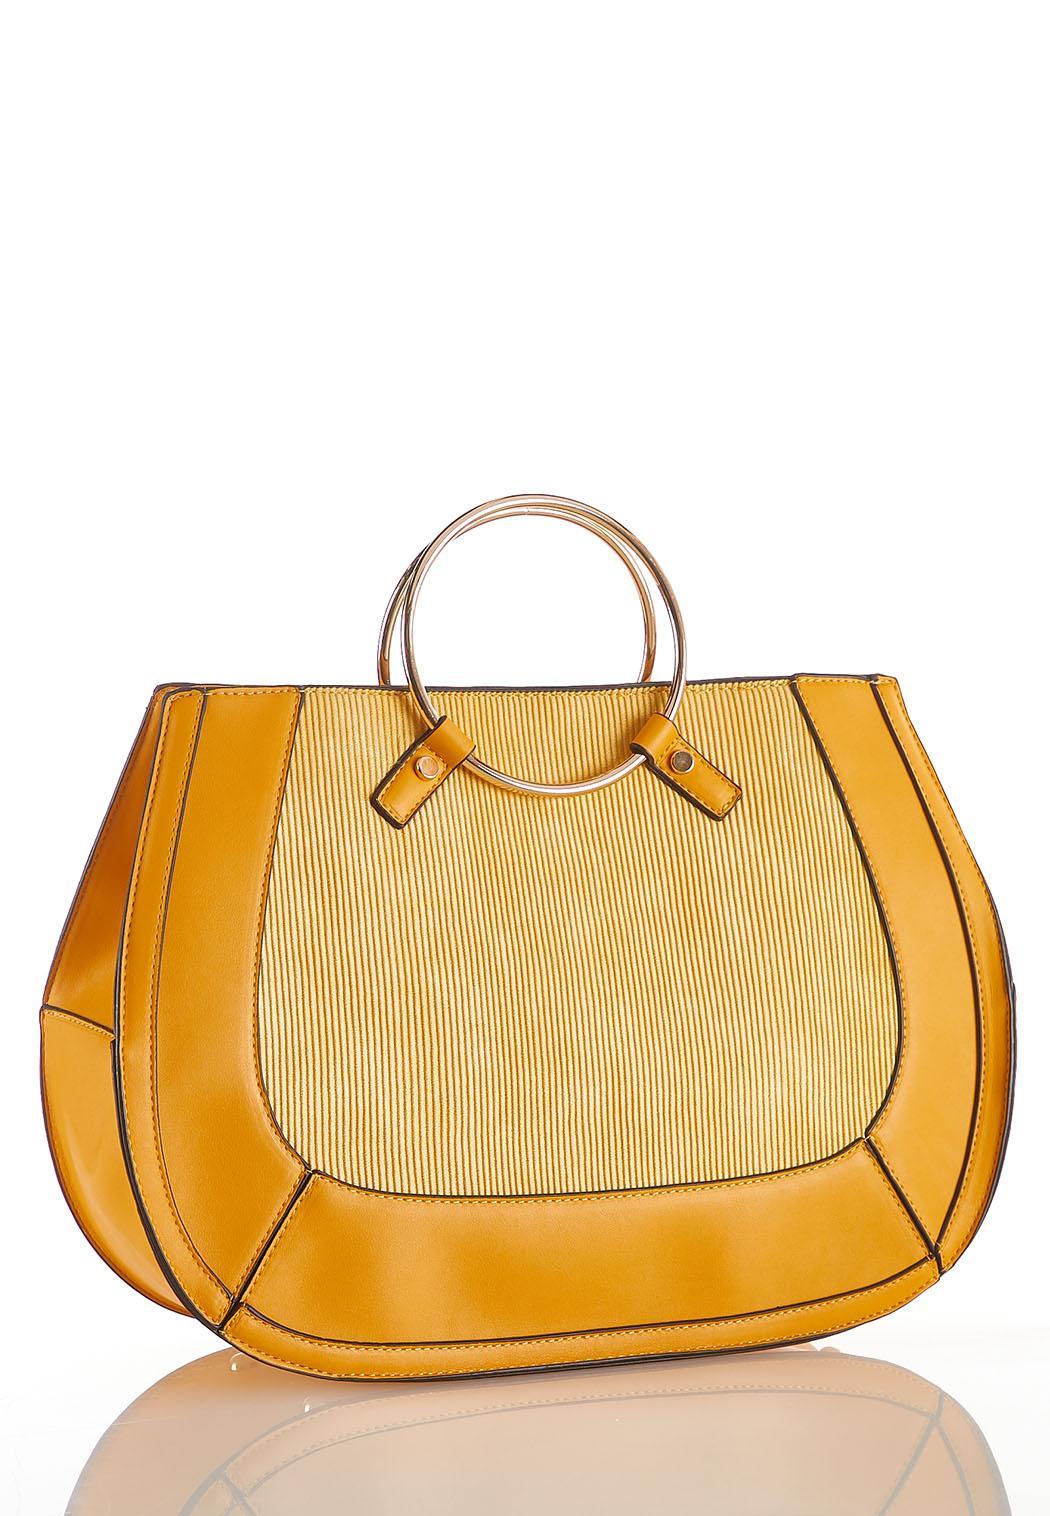 db218a7bc23d Women's Handbags